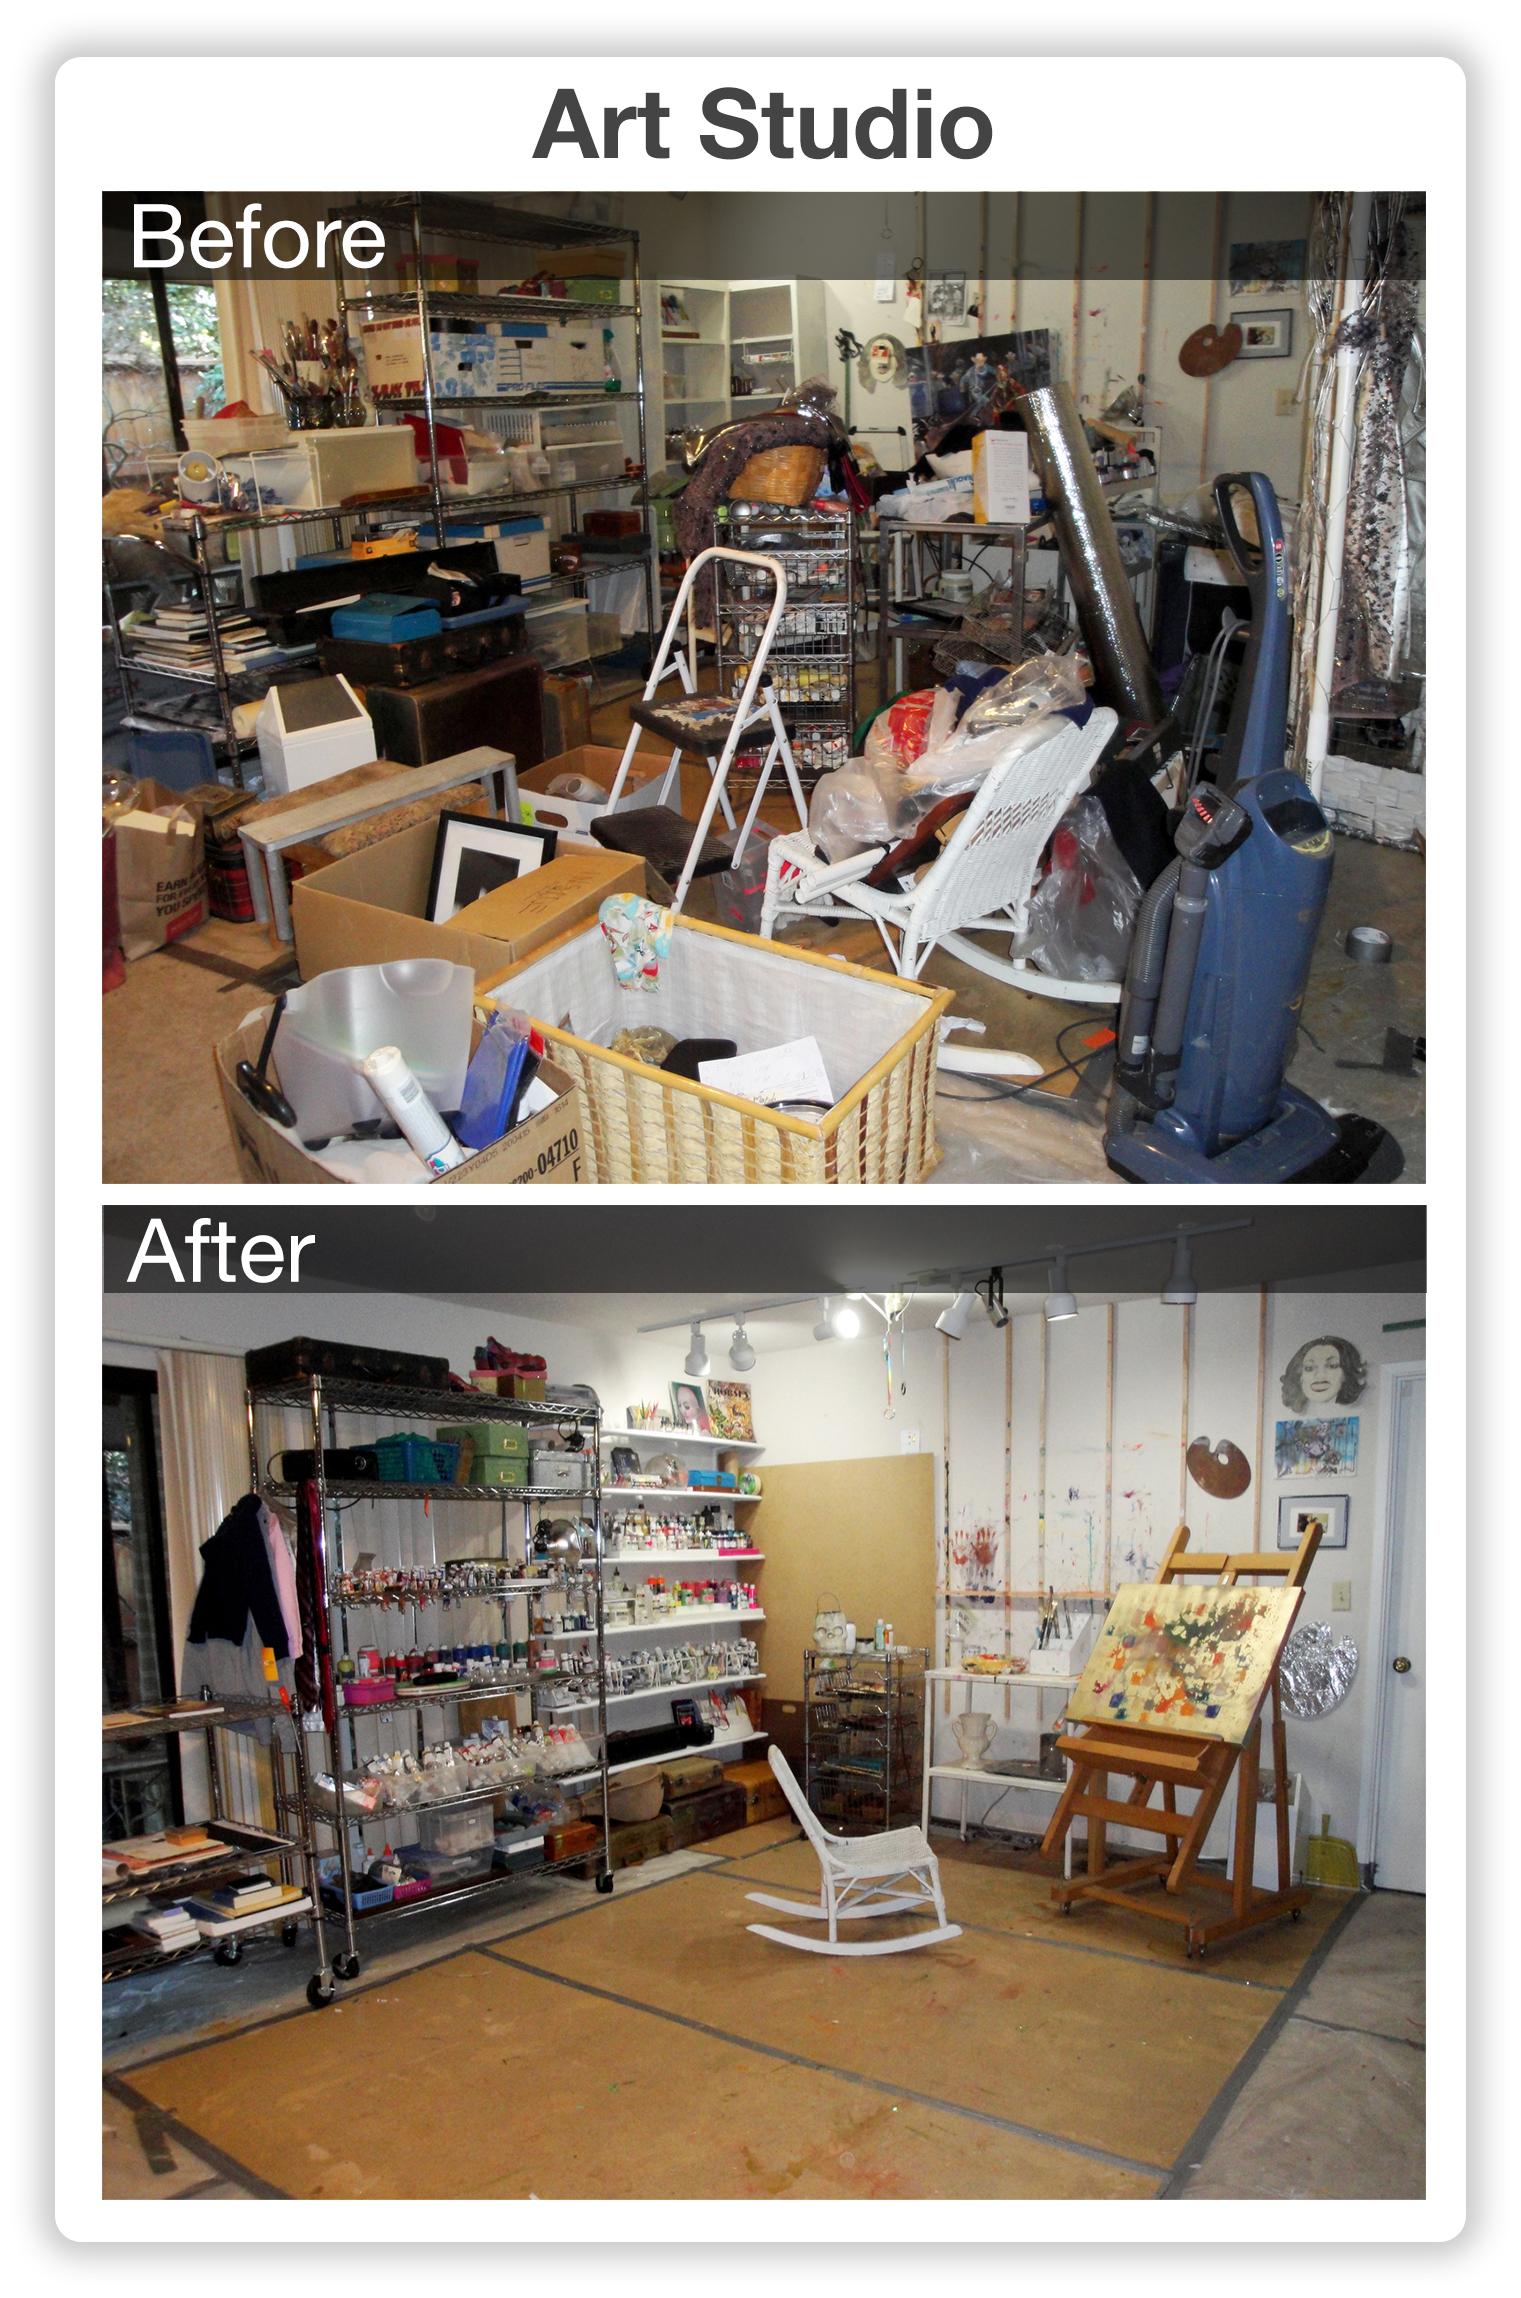 organized_by_choice_art_studio.jpg